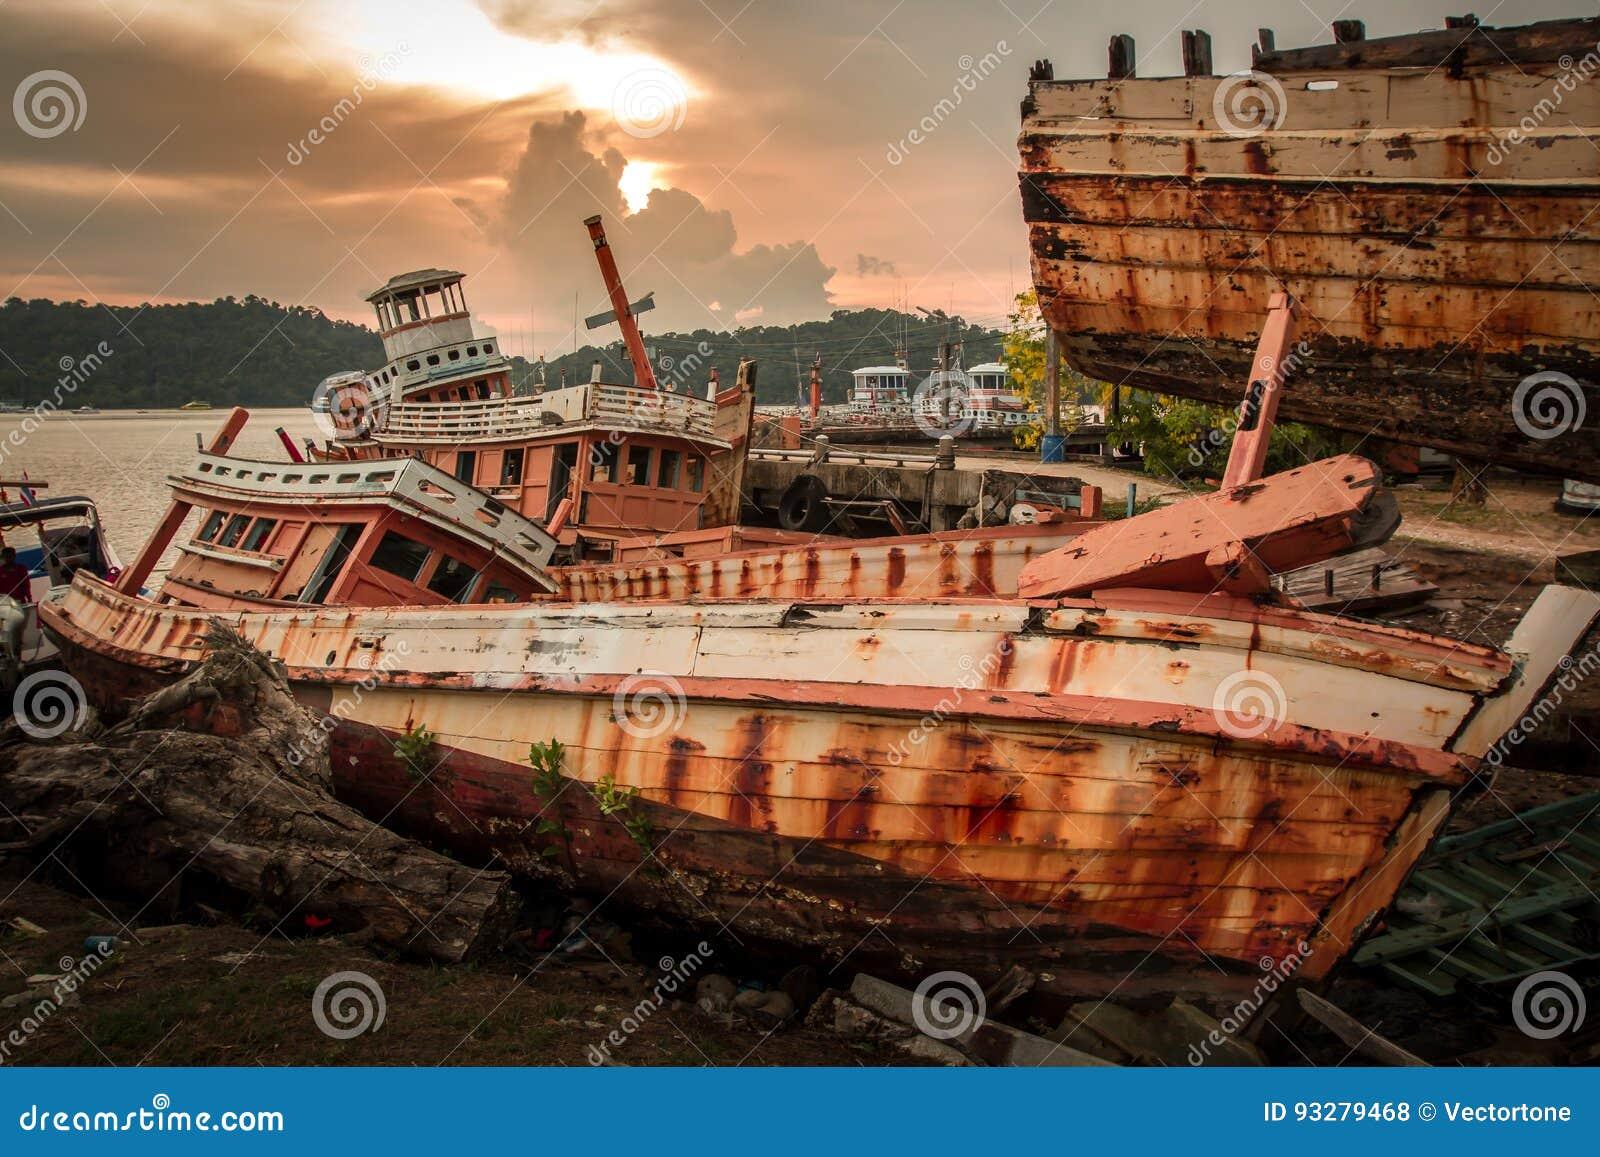 O barco de pesca quebrado saiu abandonado na terra perto do porto